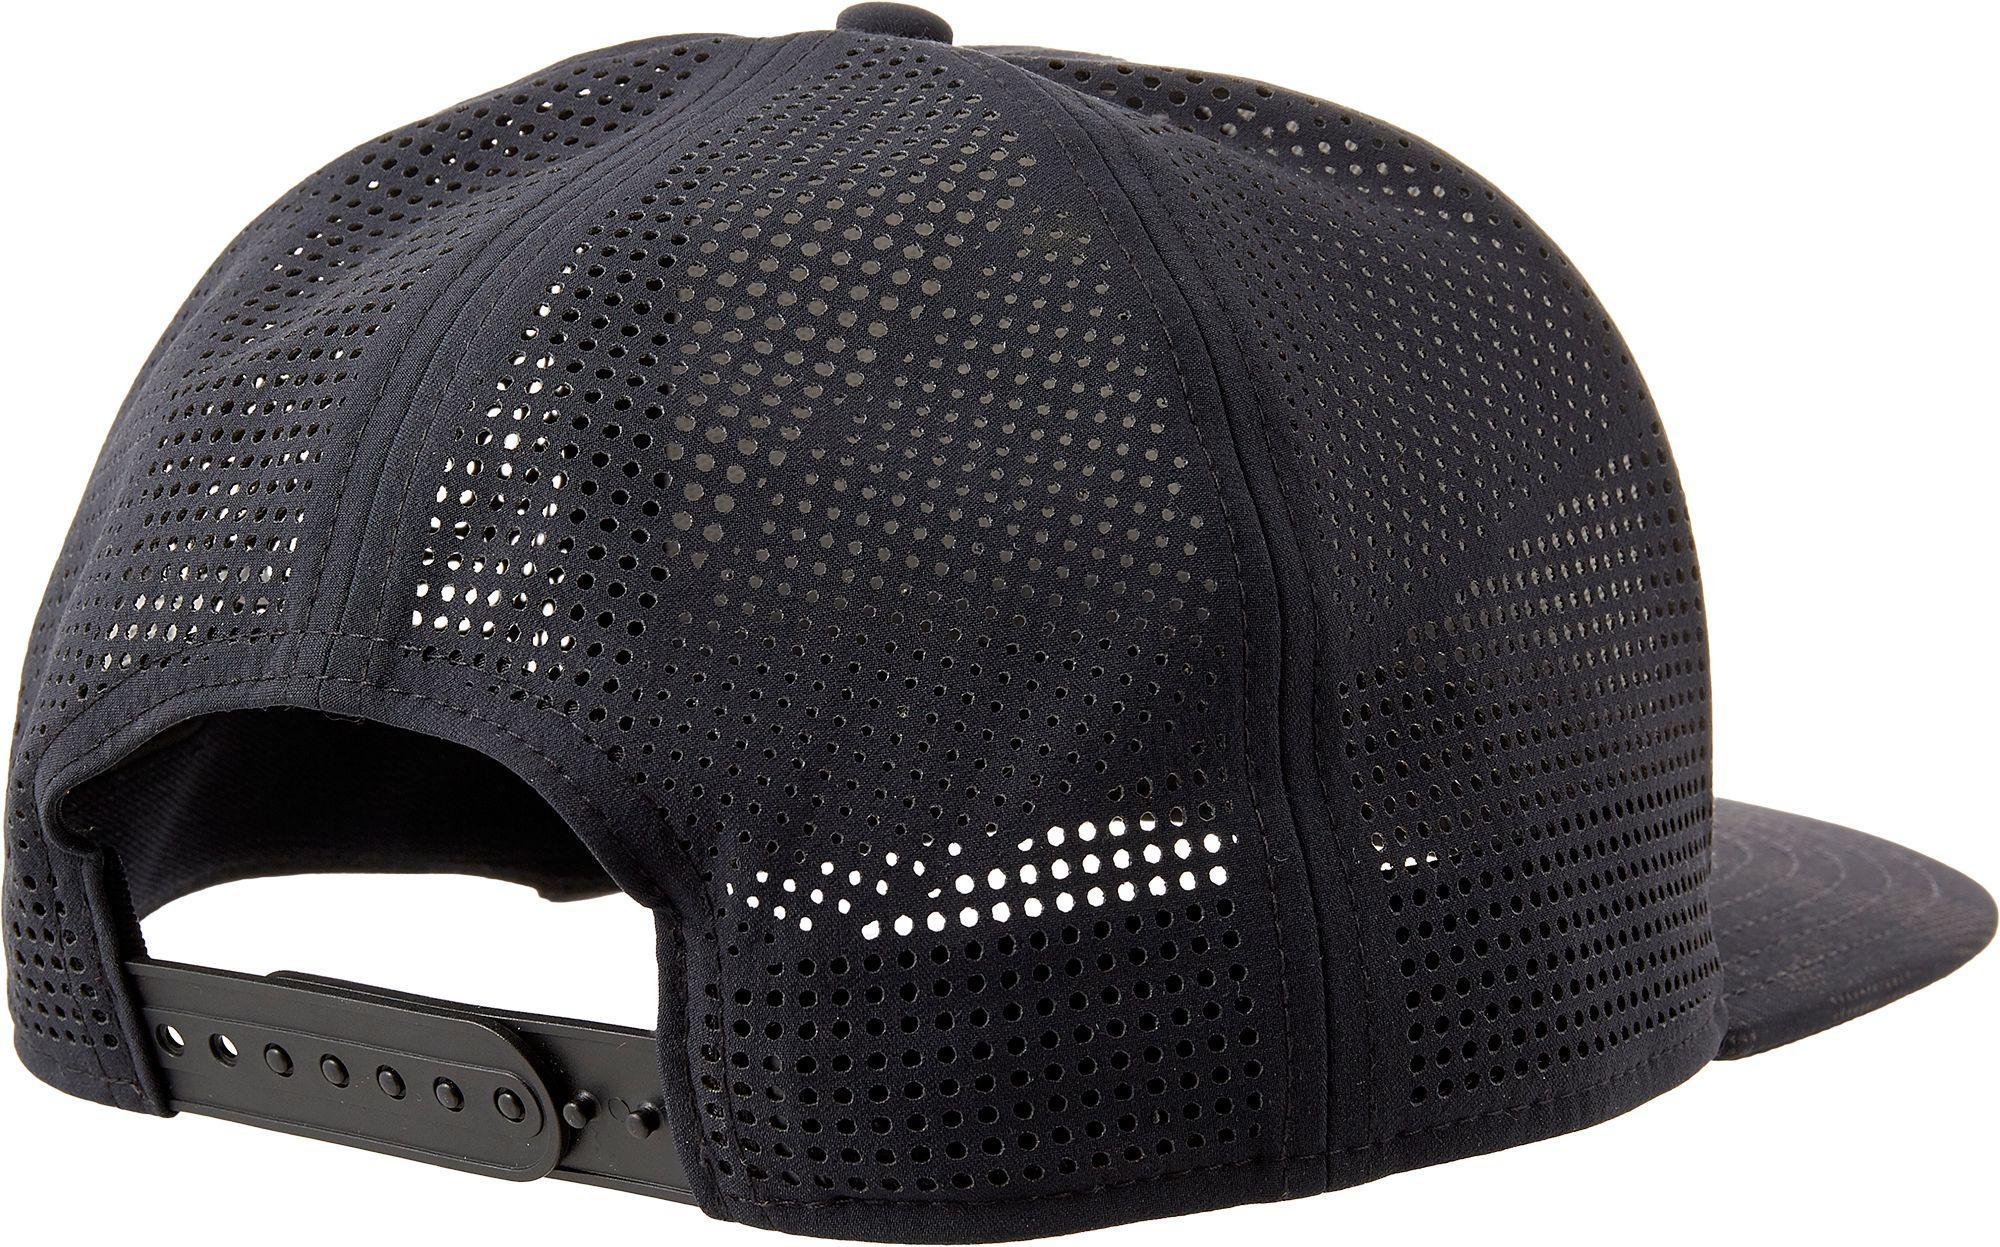 Lyst - Under Armour Project Rock Supervent Snapback Hat in Black for Men 7f474d36d4d